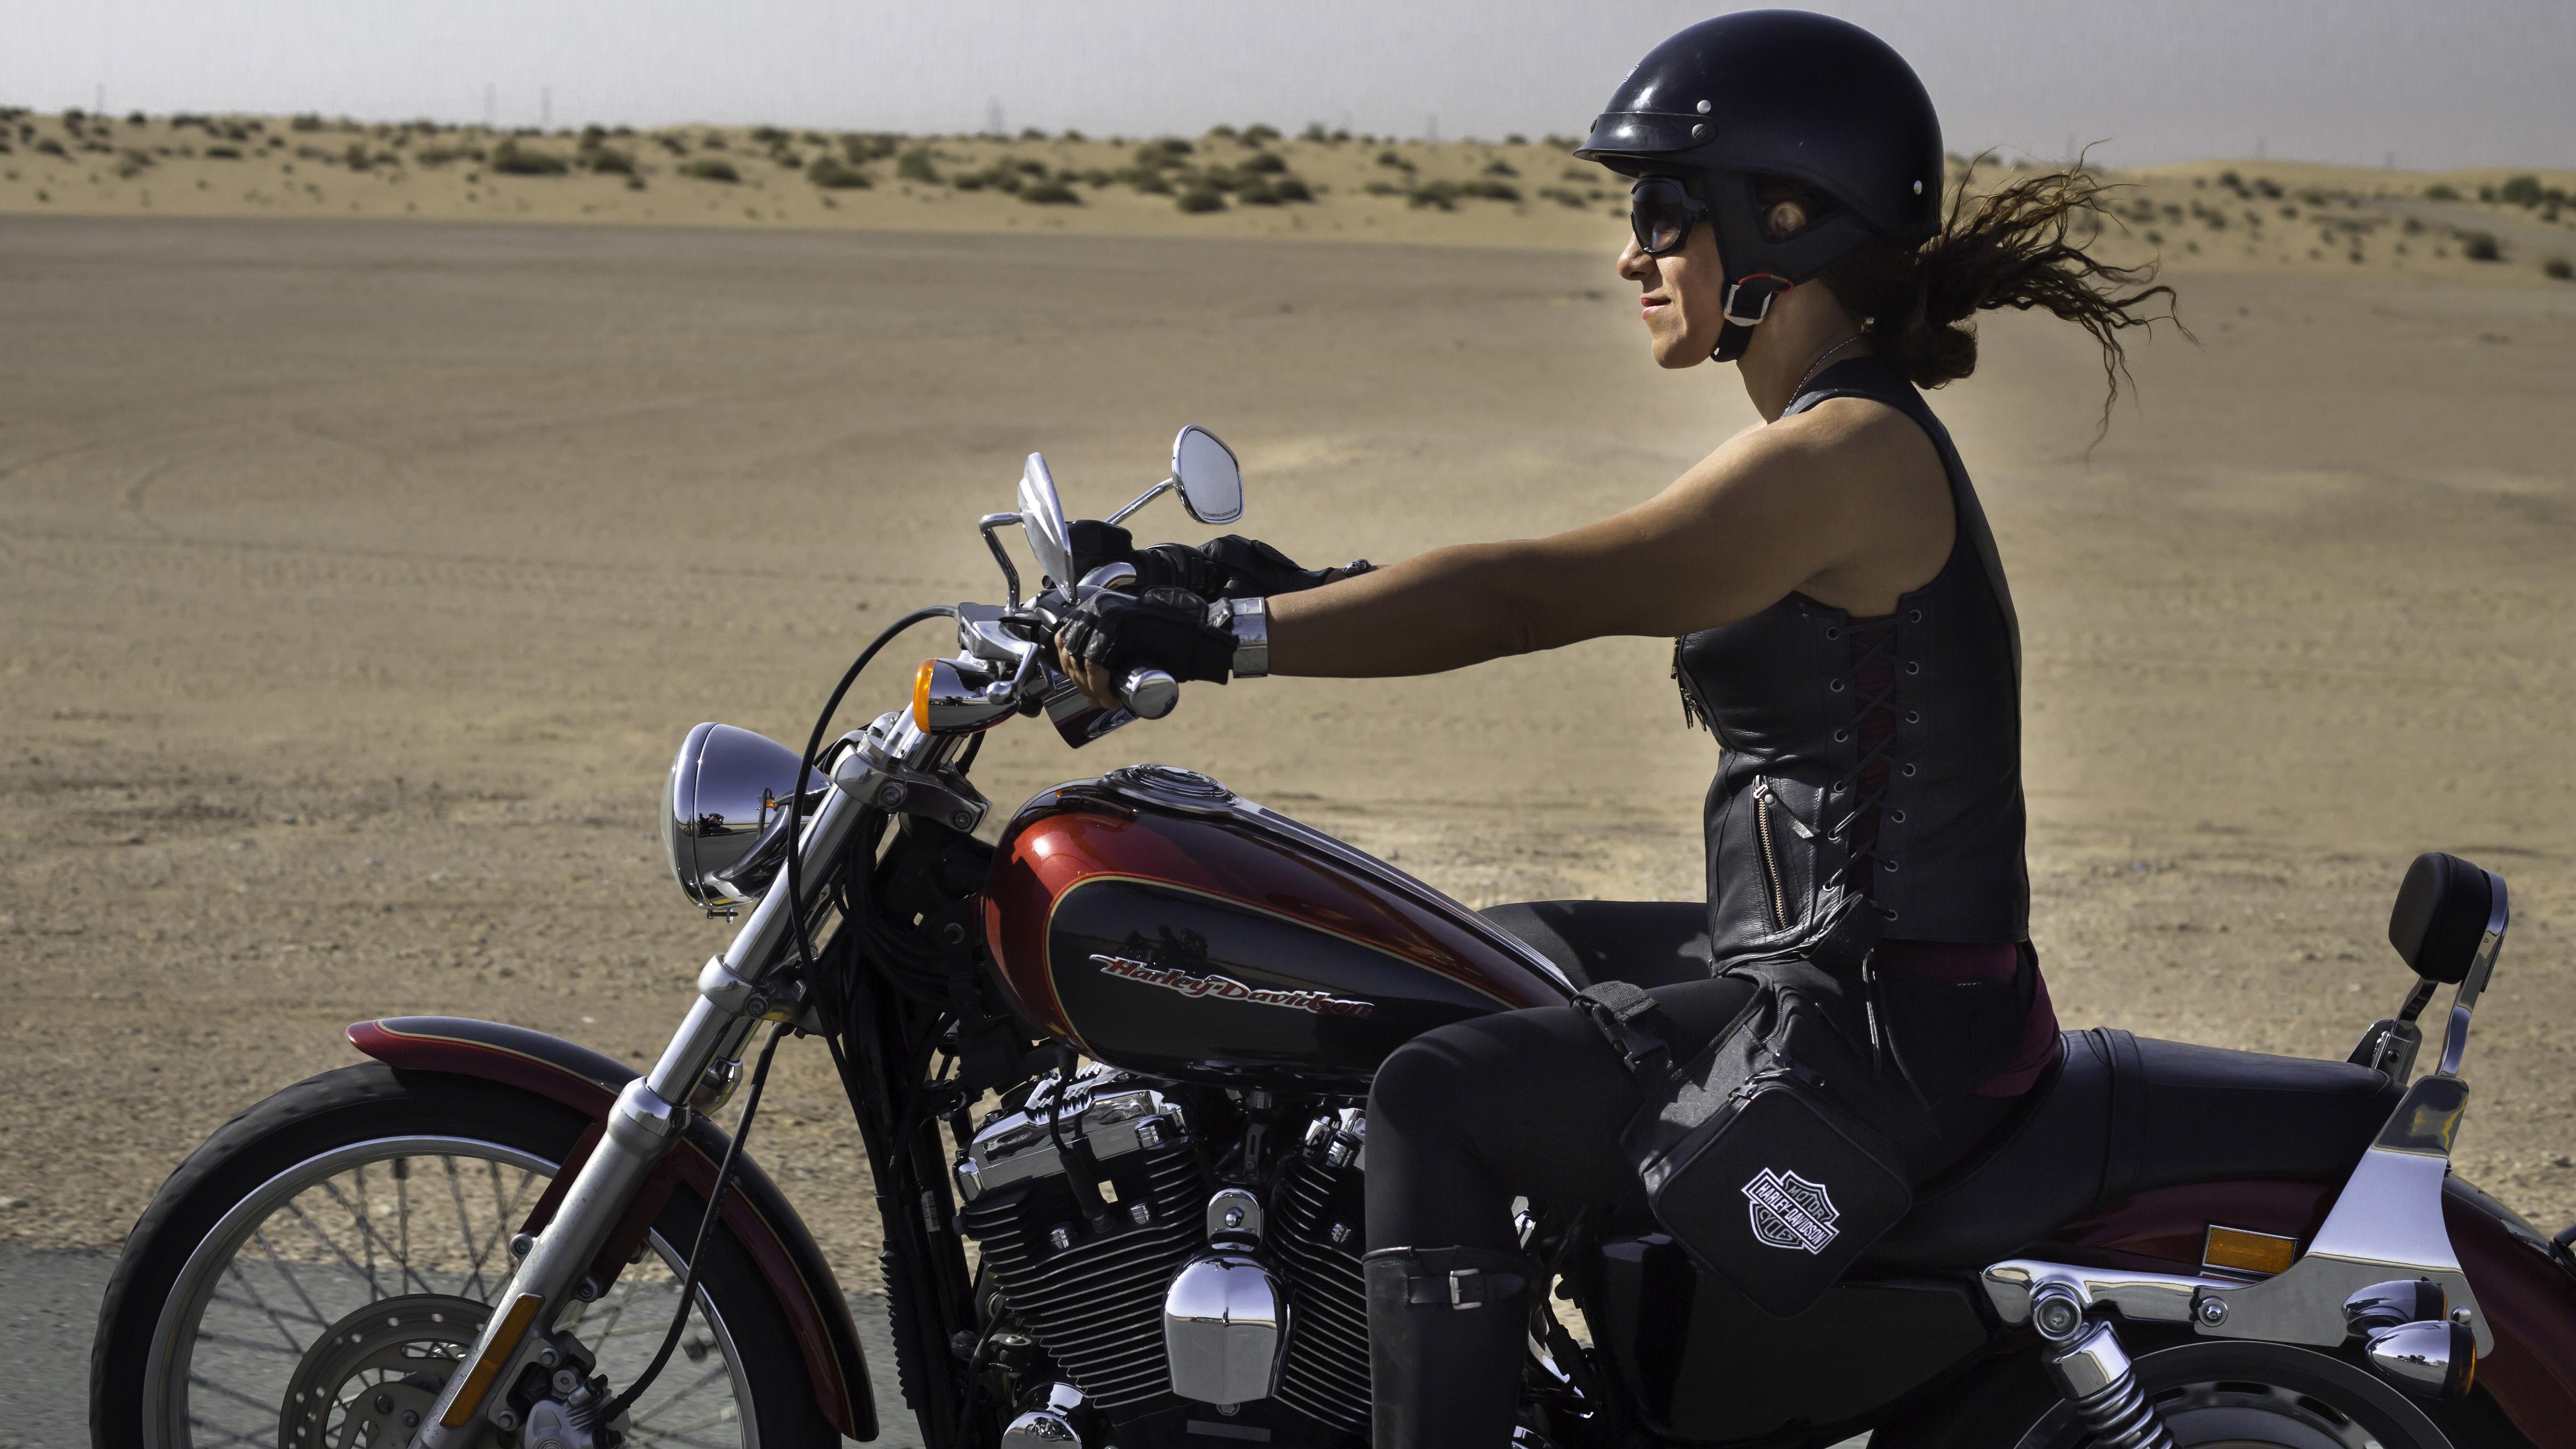 Harley Riders: On Dubai's Roads, Women Hop On Harleys And Shatter